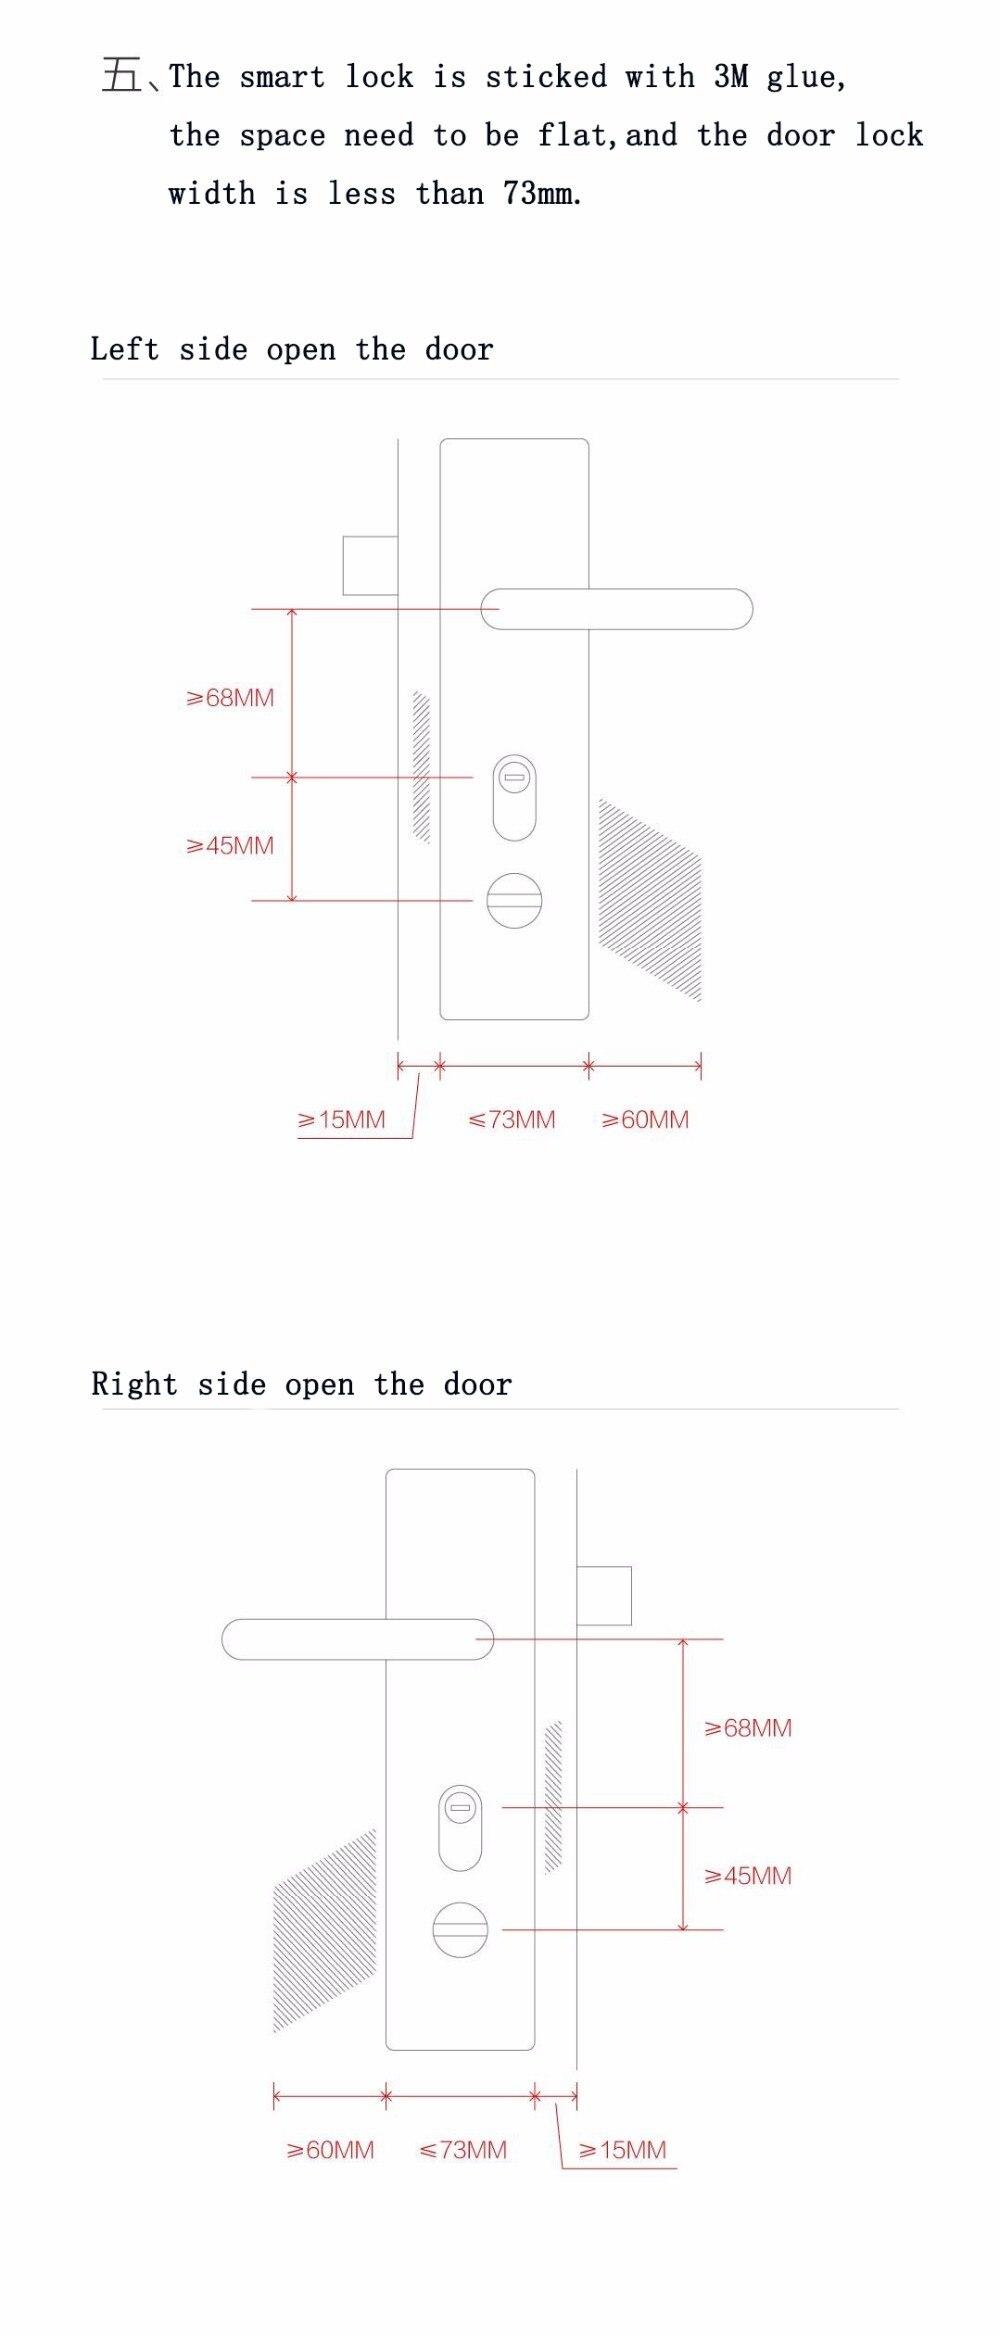 Xiaomi Sherlock Smart Home Door Lock M1 Mijia Keyless Fingerprint. Hh Gg Ii Jj Kk N. Wiring. 193 F800 Windshield Wiper Switch Wiring Diagram At Scoala.co